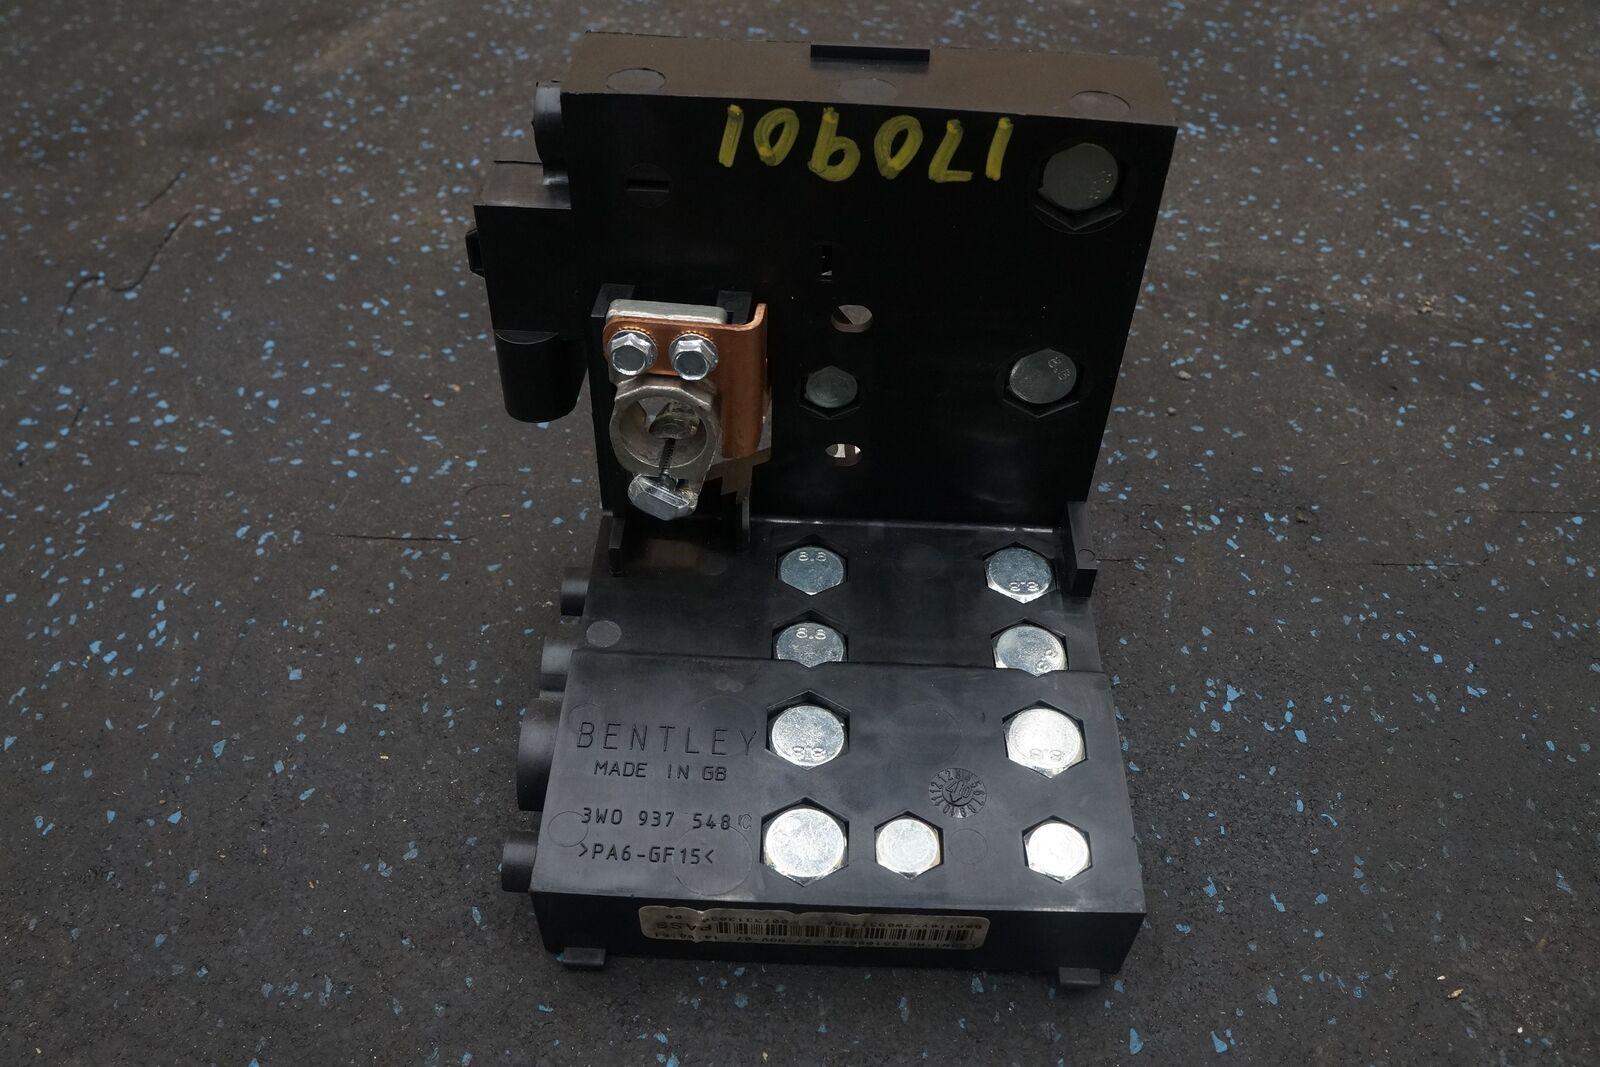 battery mounted fuse box block 3w0937548 3w0937495a bentley ford focus fuse box diagram bentley fuse box #48